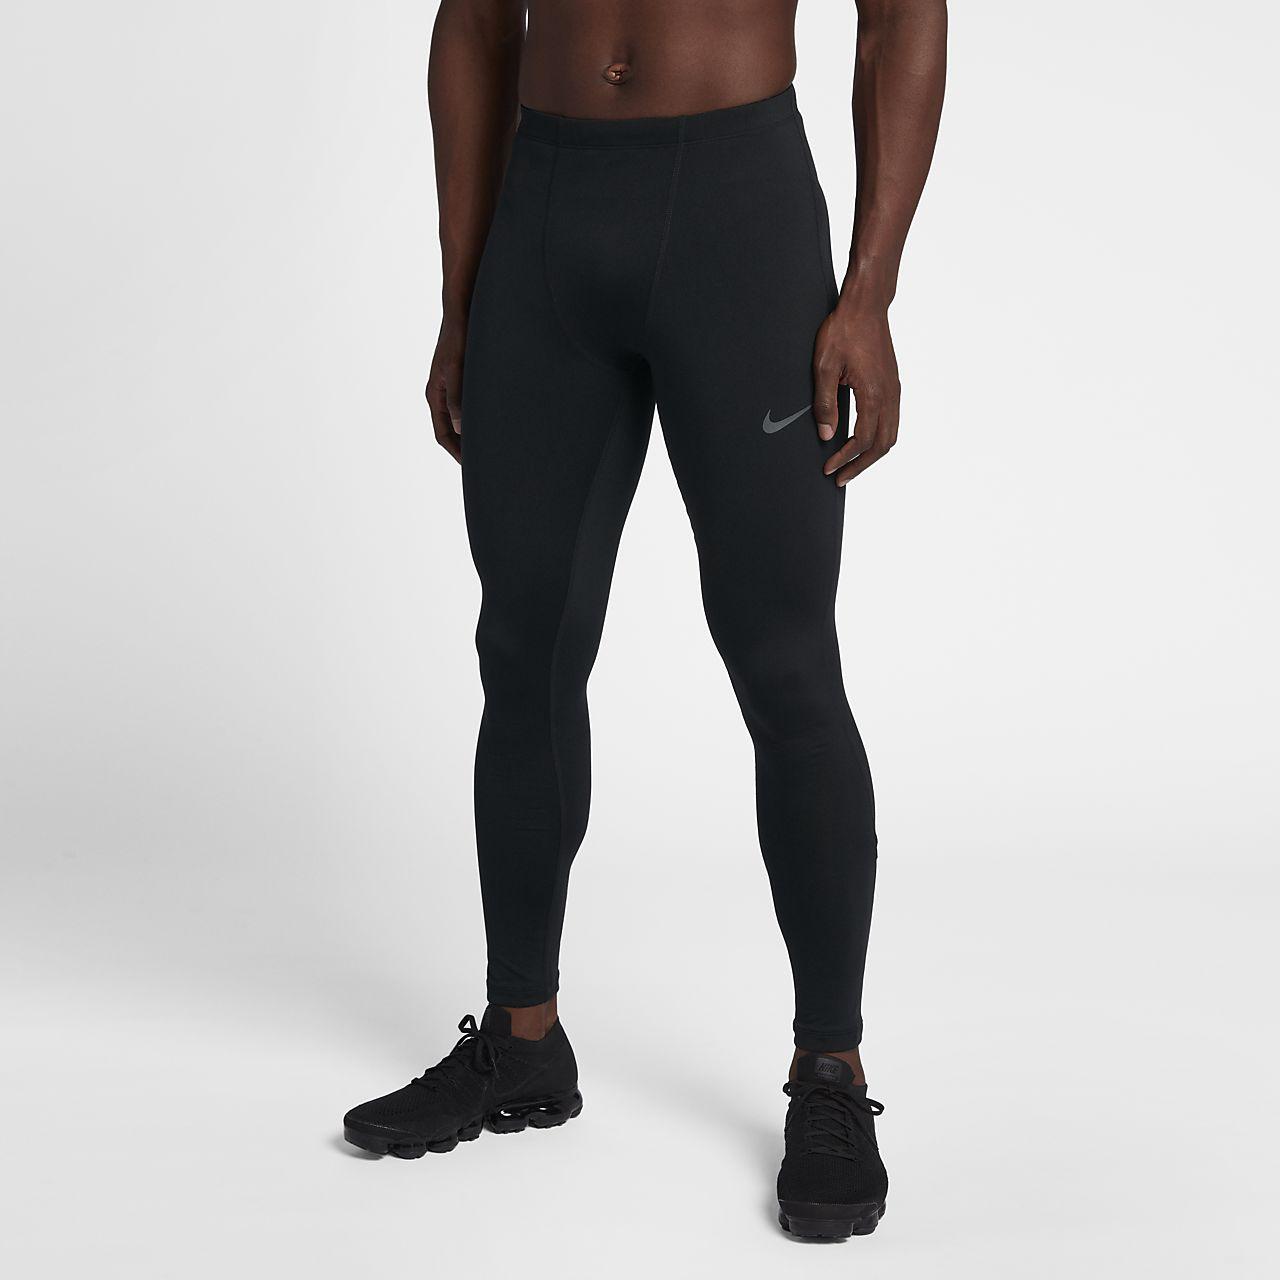 Nike Malles de running - Home